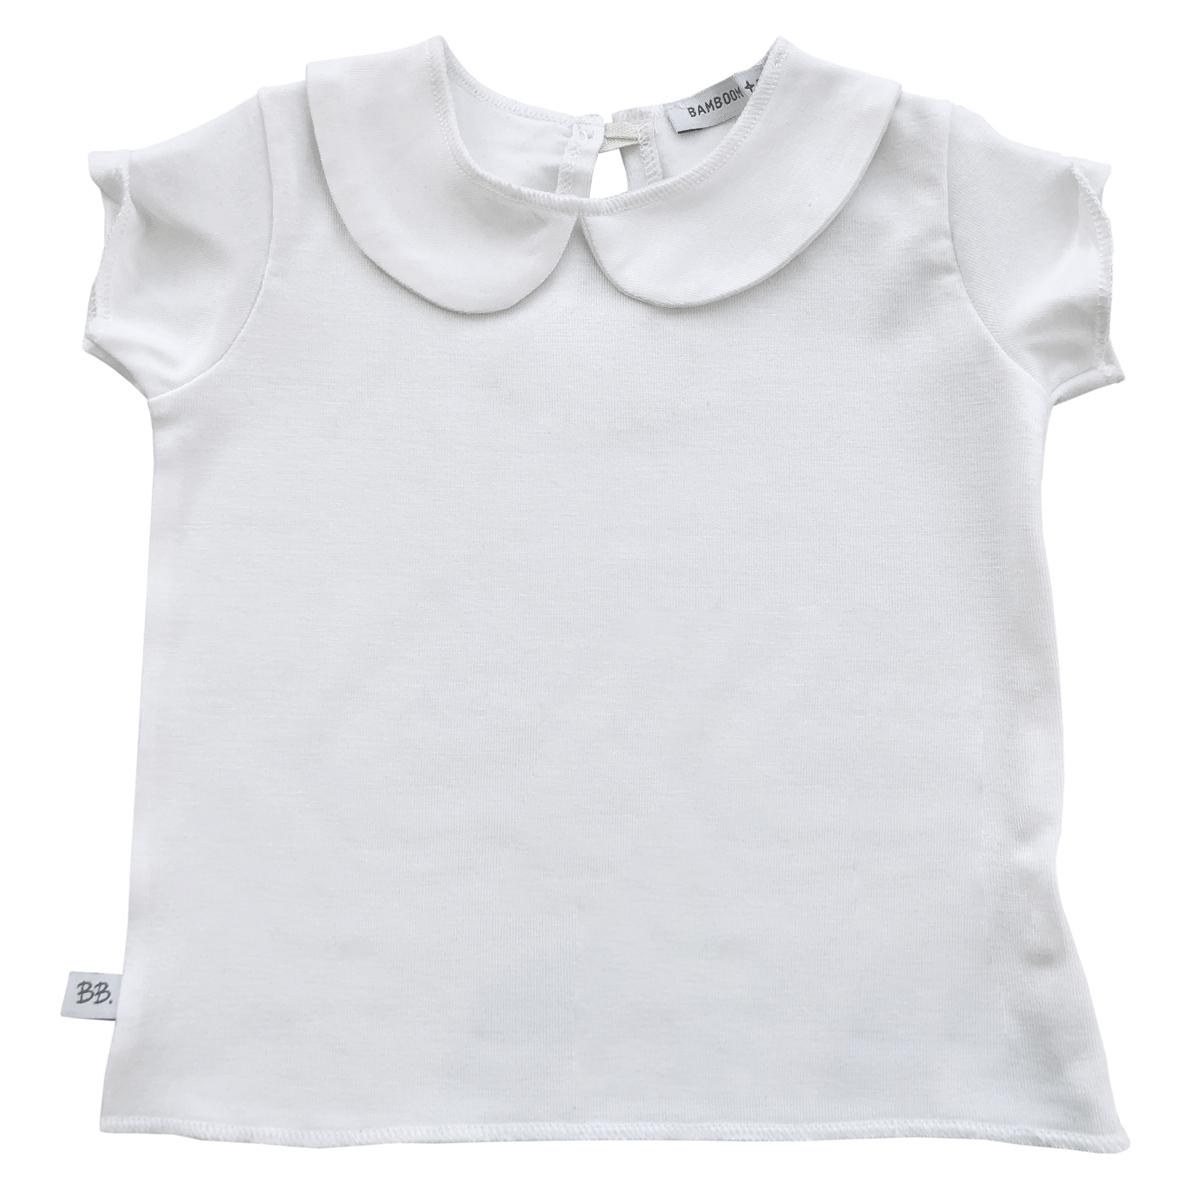 Haut bébé Tee-Shirt Col Claudine Blanc - 18 Mois Tee-Shirt Col Claudine Blanc - 18 Mois